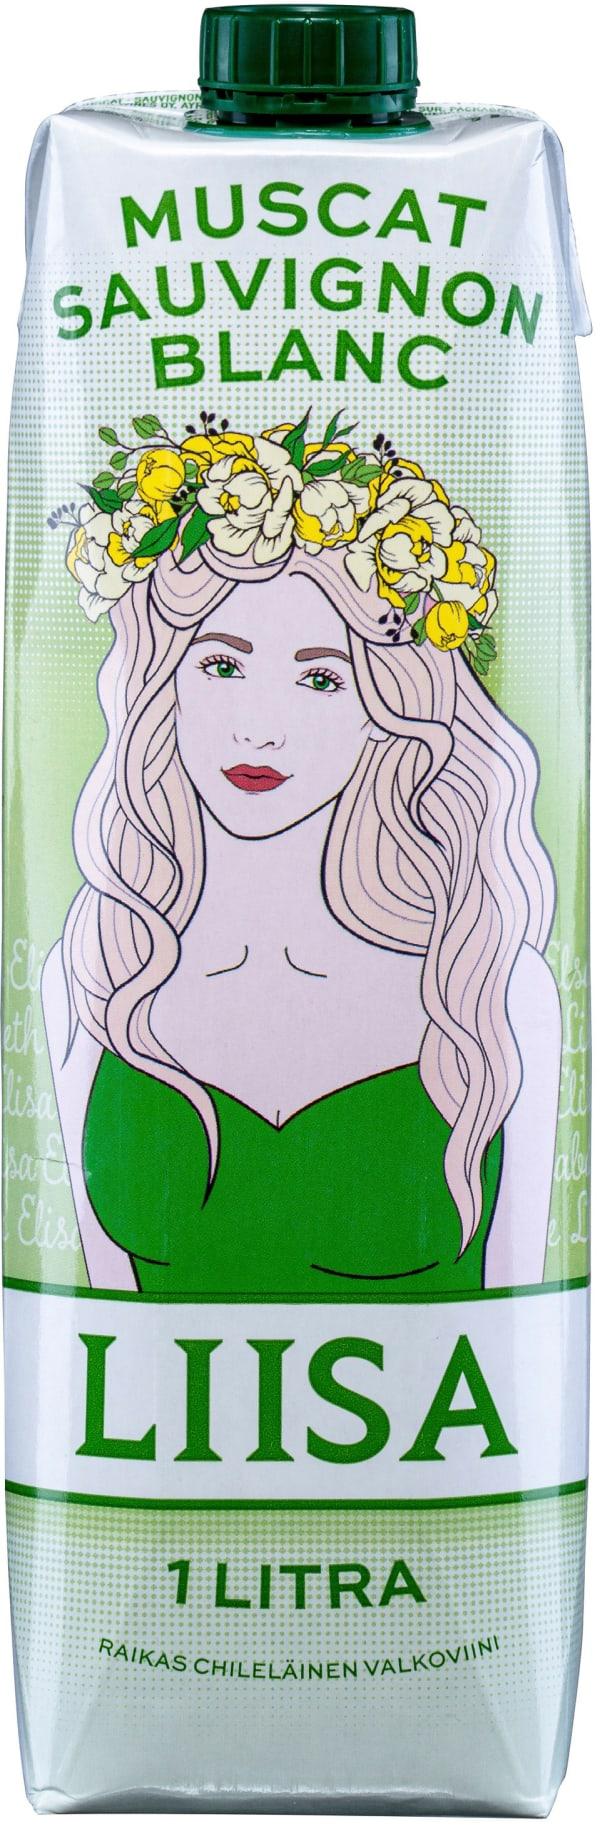 Liisa Muscat Sauvignon Blanc carton package